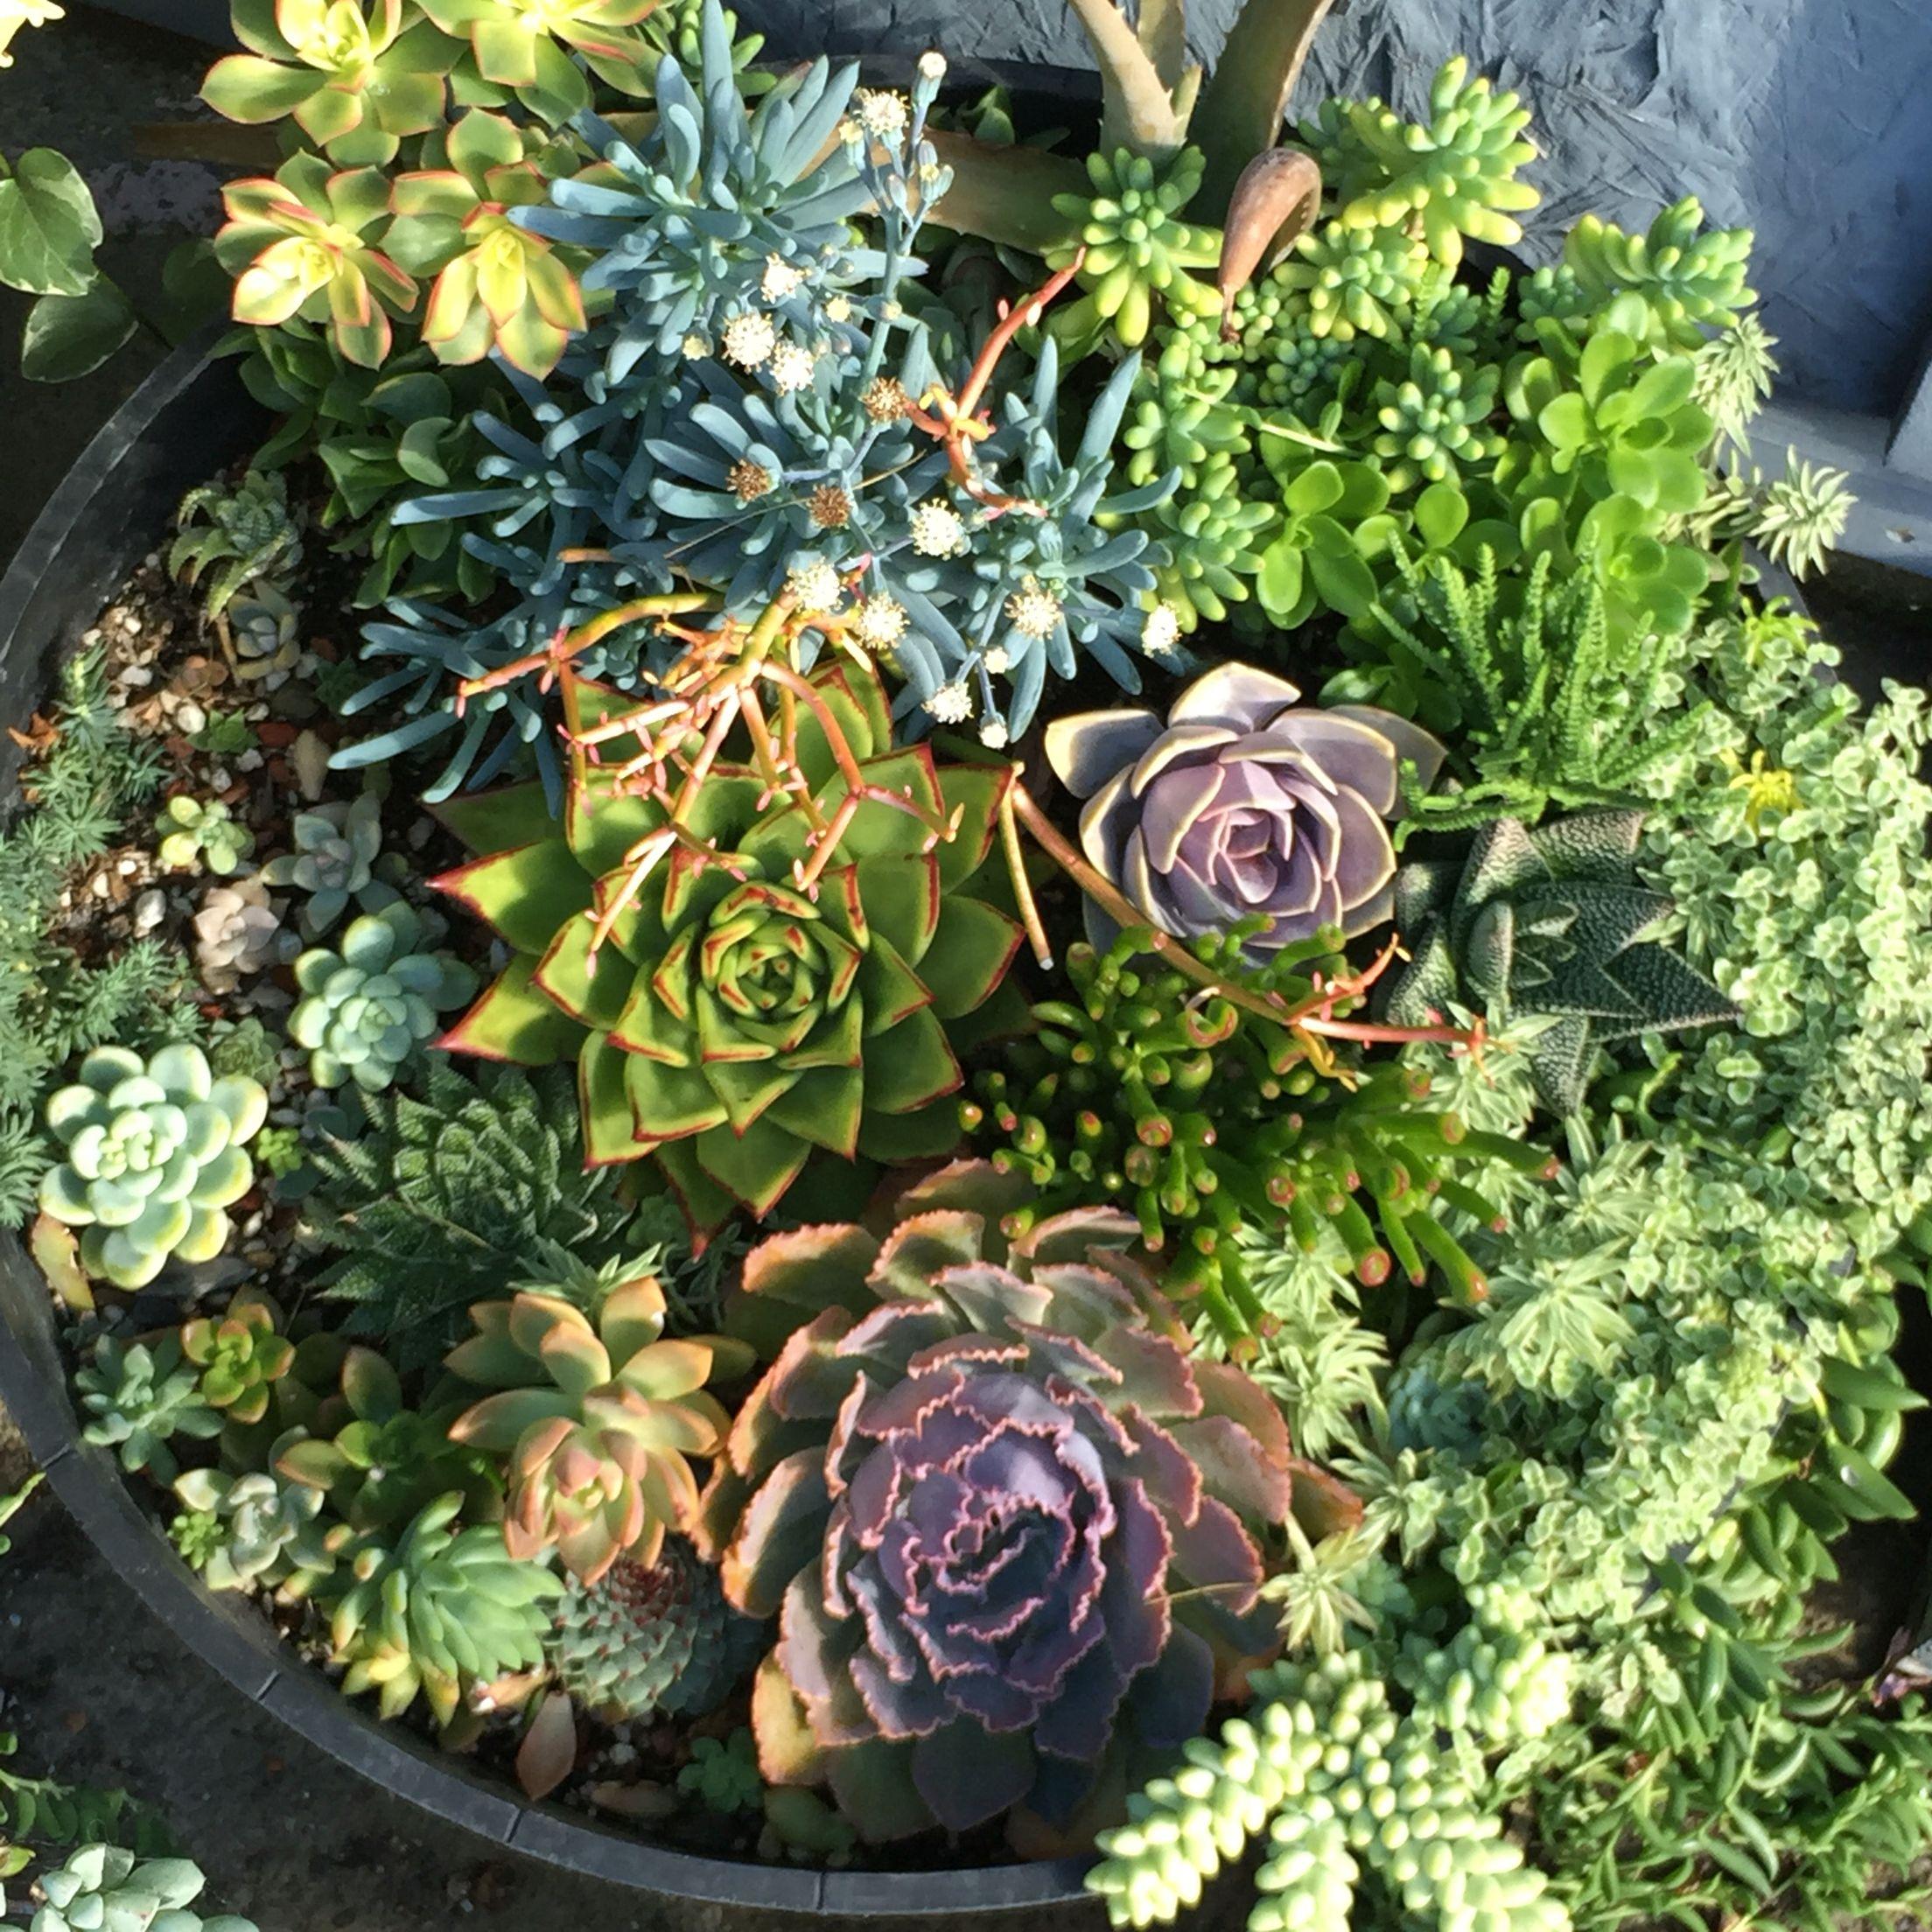 Susan's Garden, Murphyfrog, Succulent, Drought Resistant, Wine Barrel,  Colorful, Flower